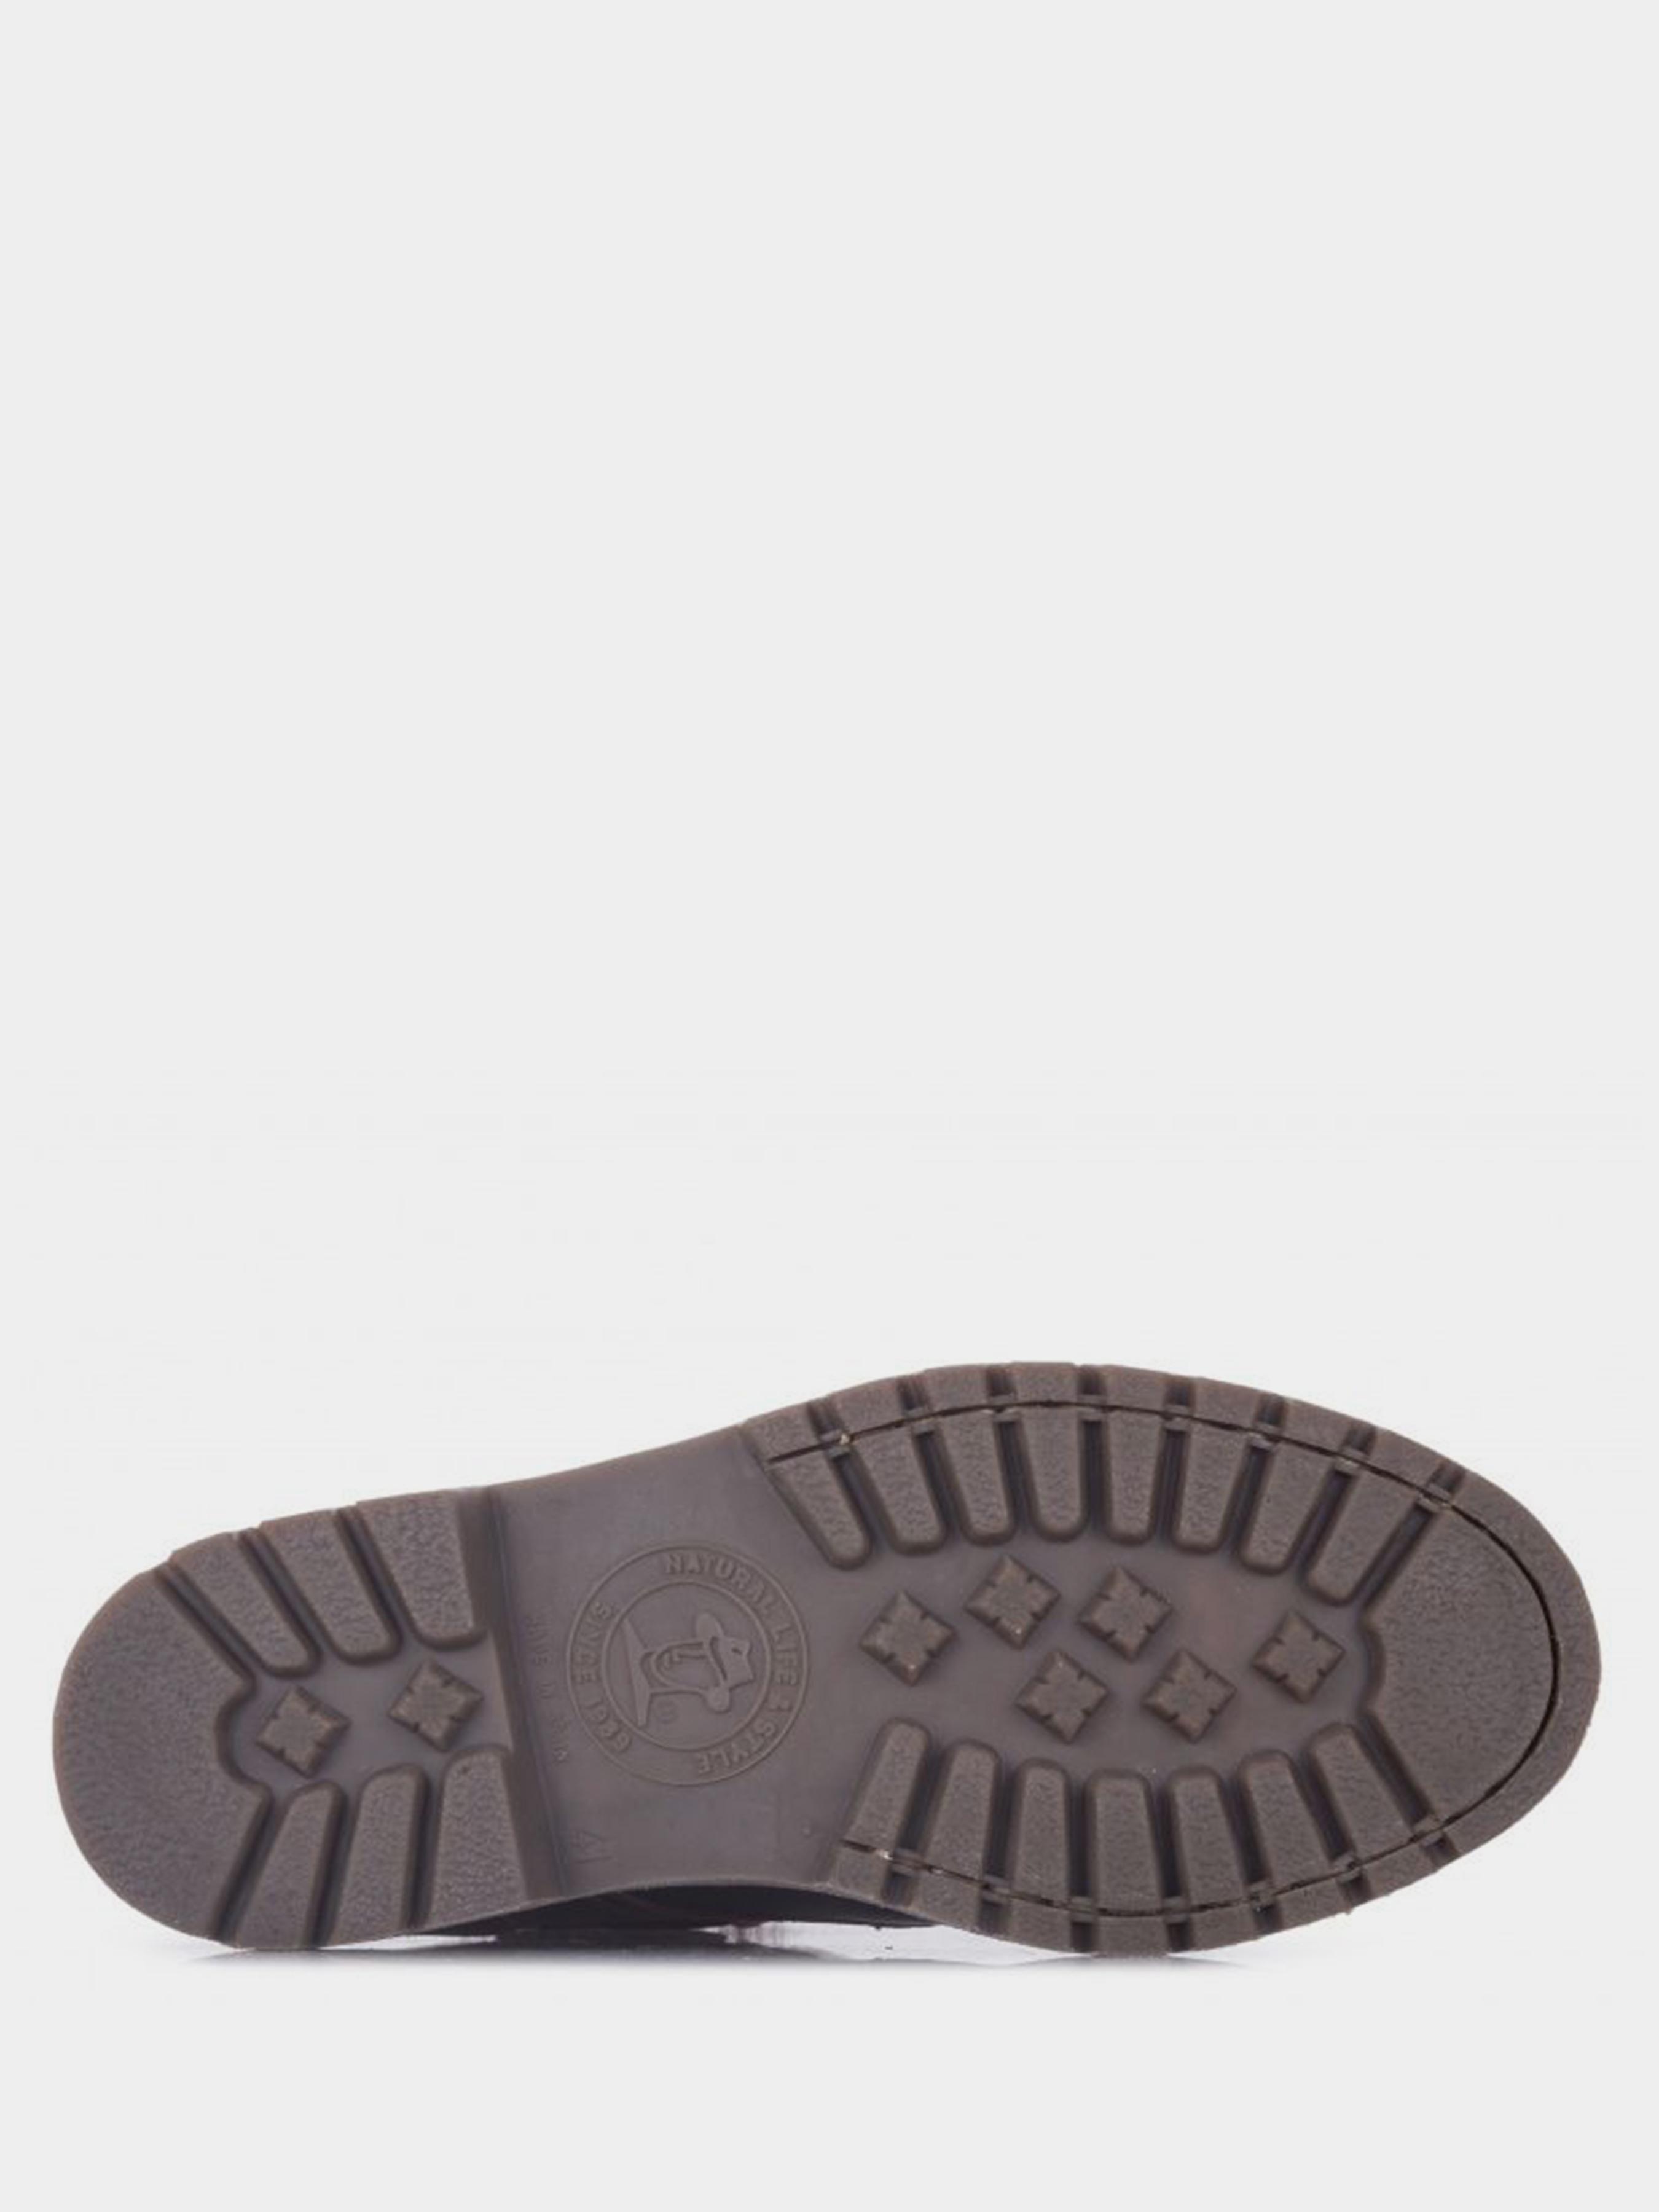 Ботинки для мужчин Panama Jack PX114 модная обувь, 2017